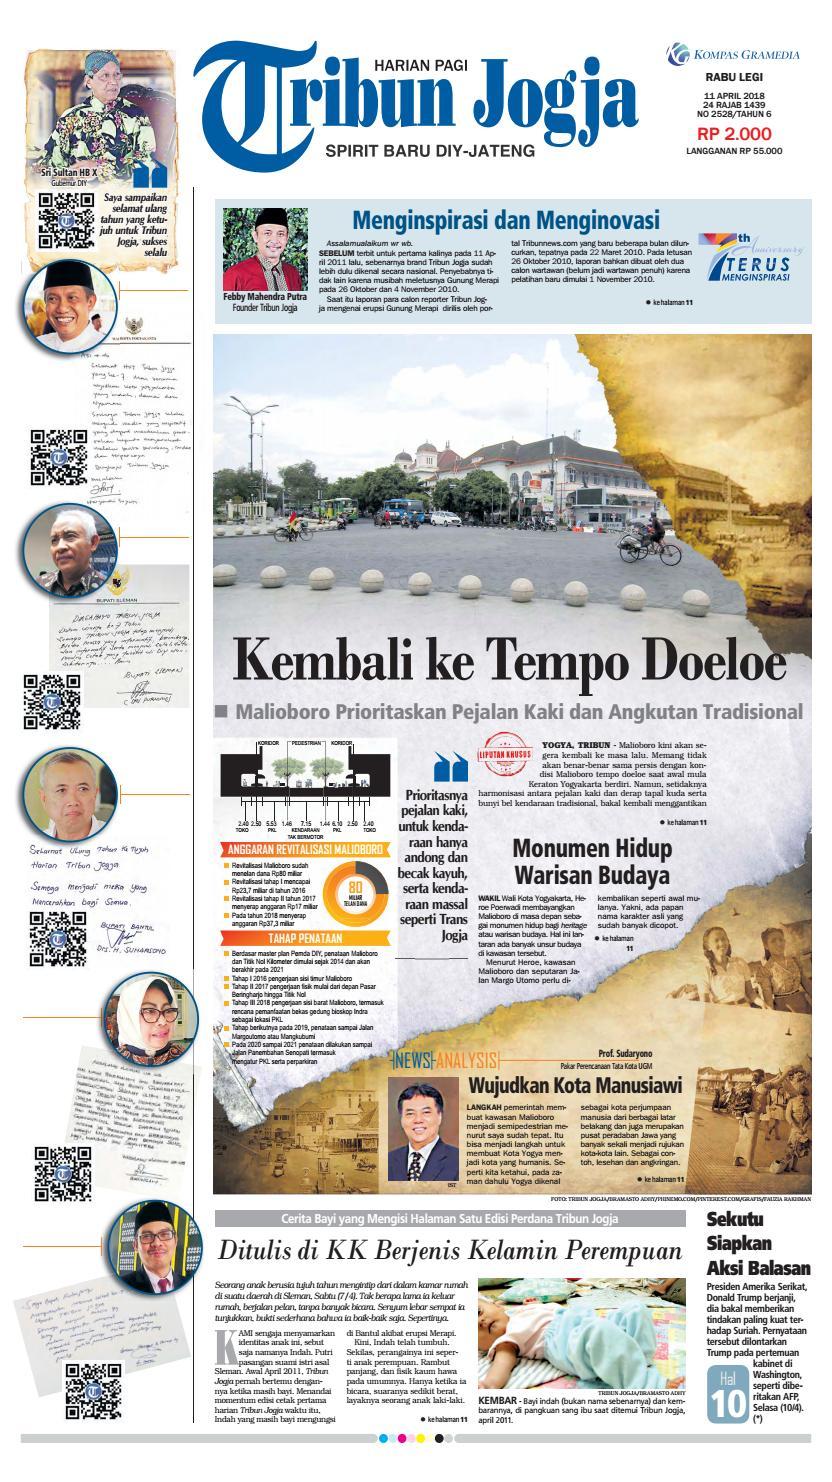 Tribunjogja 11 04 2018 By Tribun Jogja Issuu Produk Ukm Bumn Wisata Mewah Bali 3hr 2mlm